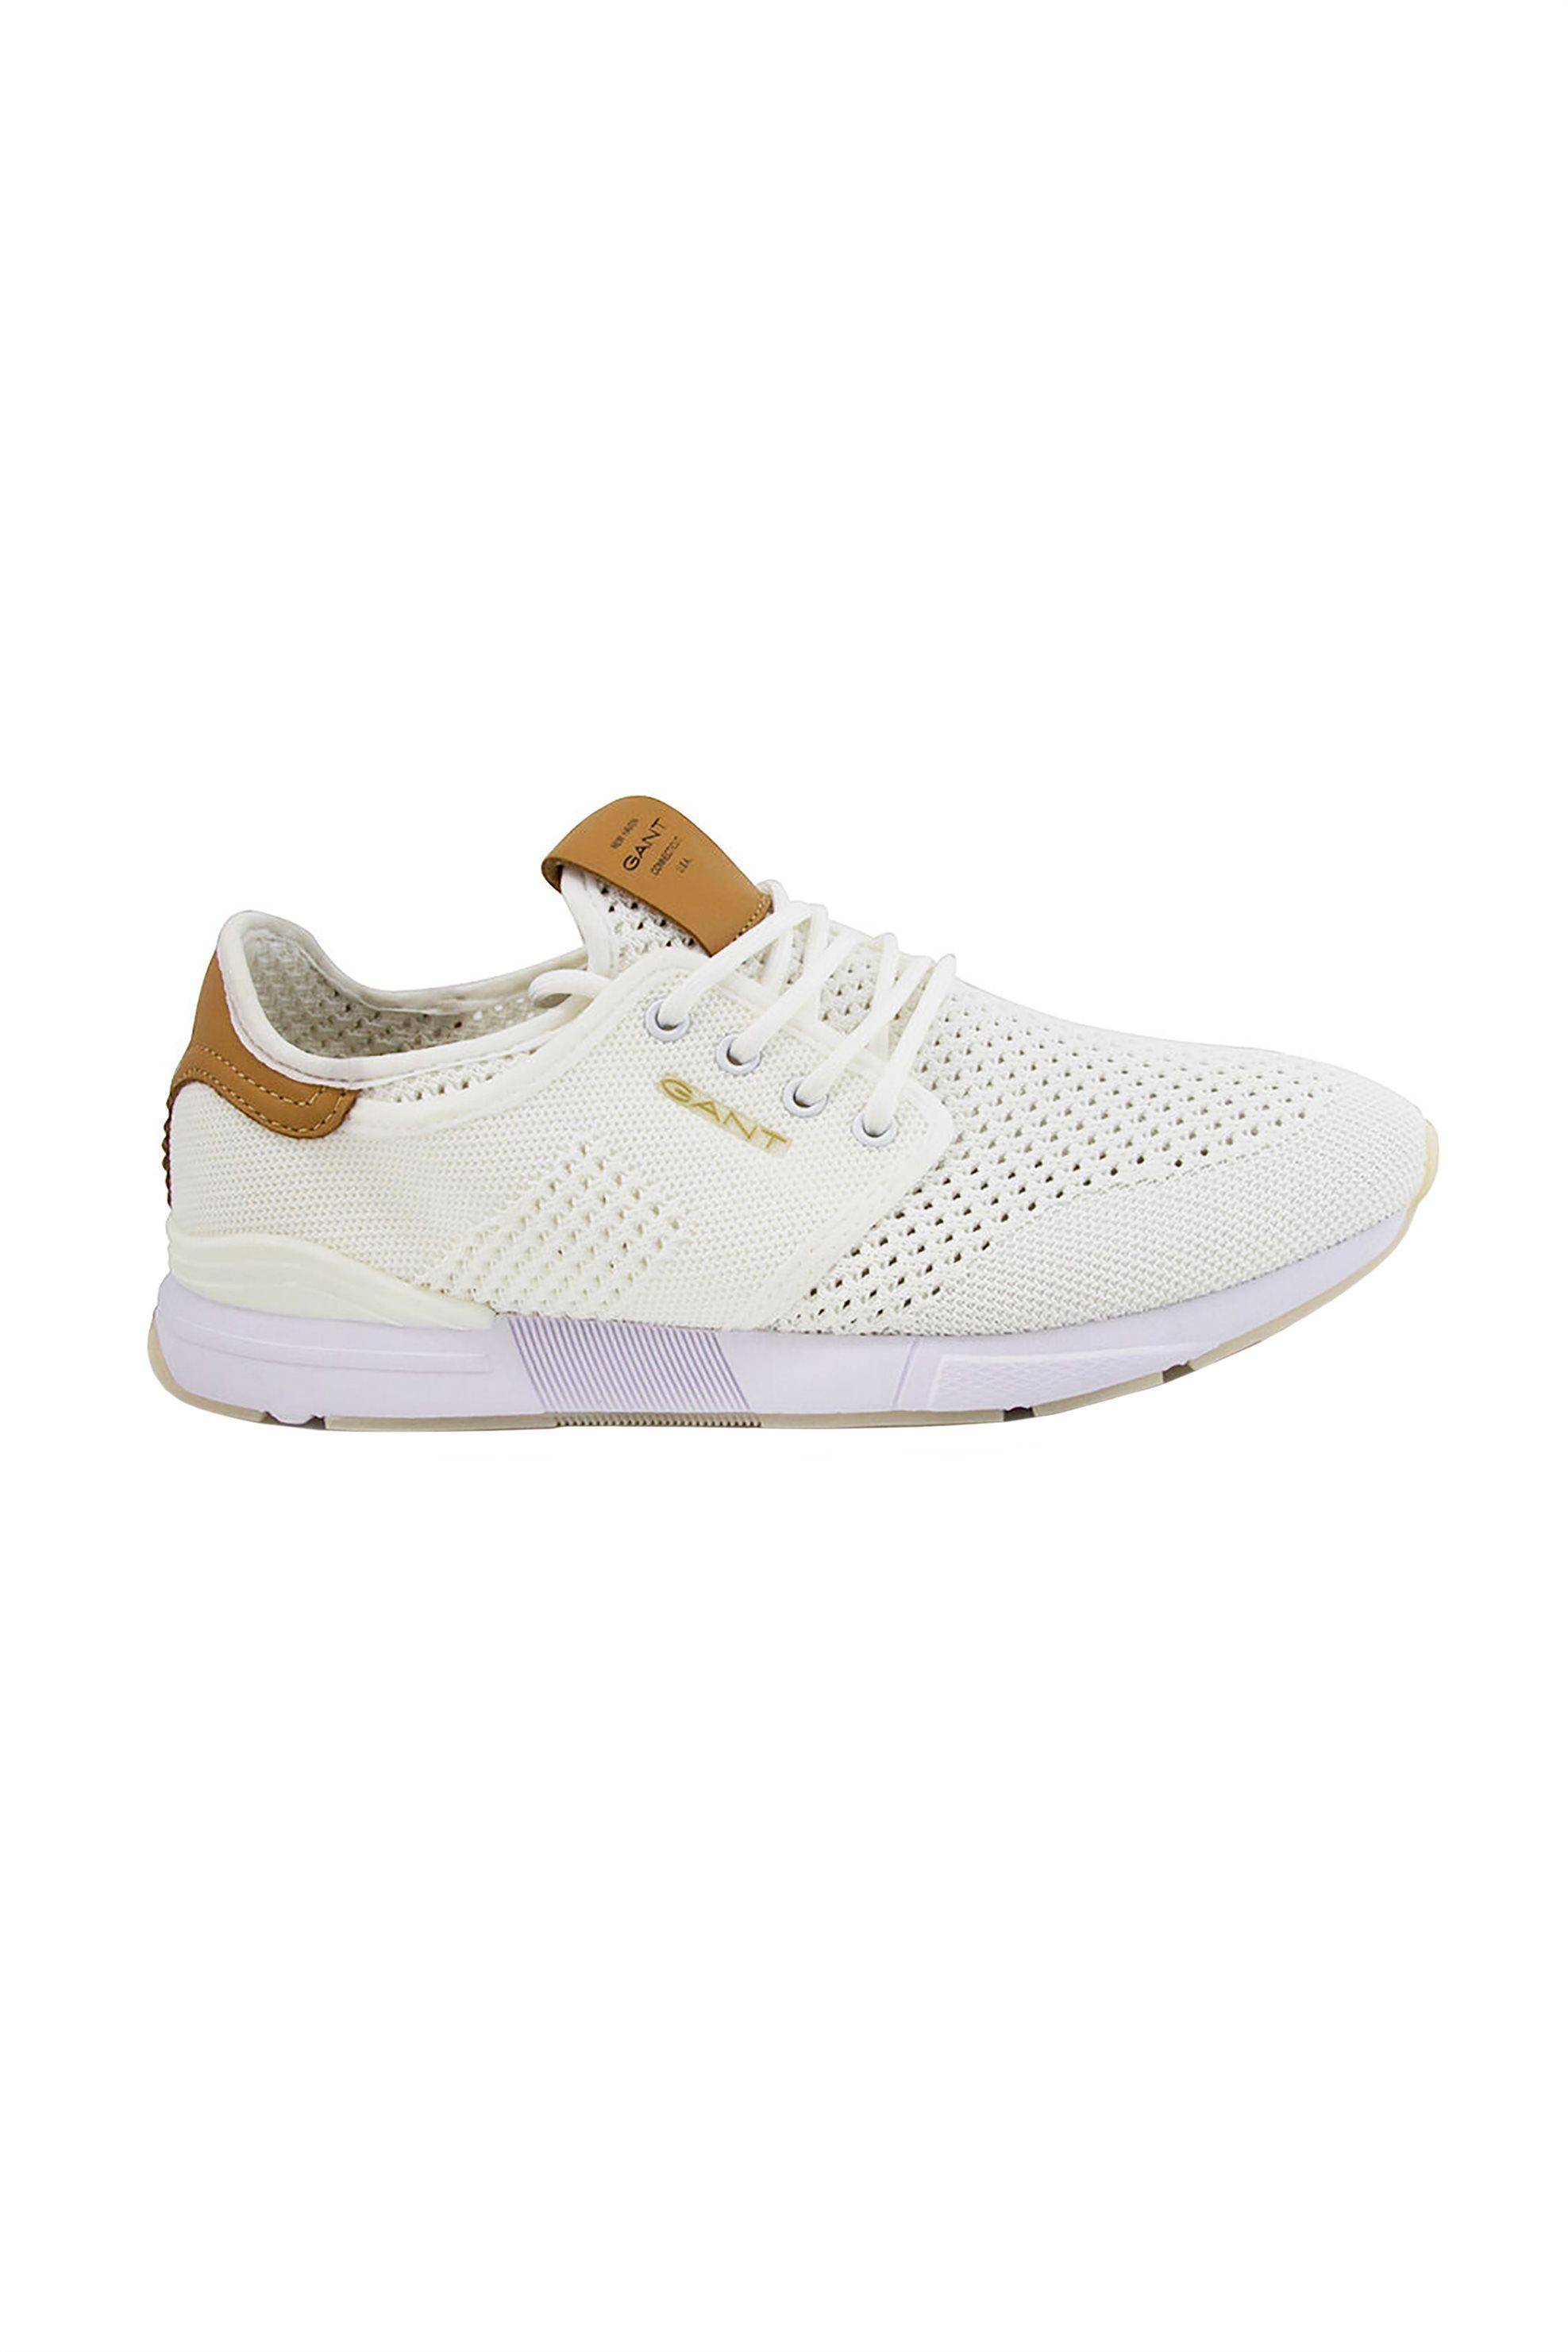 "Gant ανδρικά sneakers με κορδόνια ""Brentoon"" – 20638475 – Λευκό"